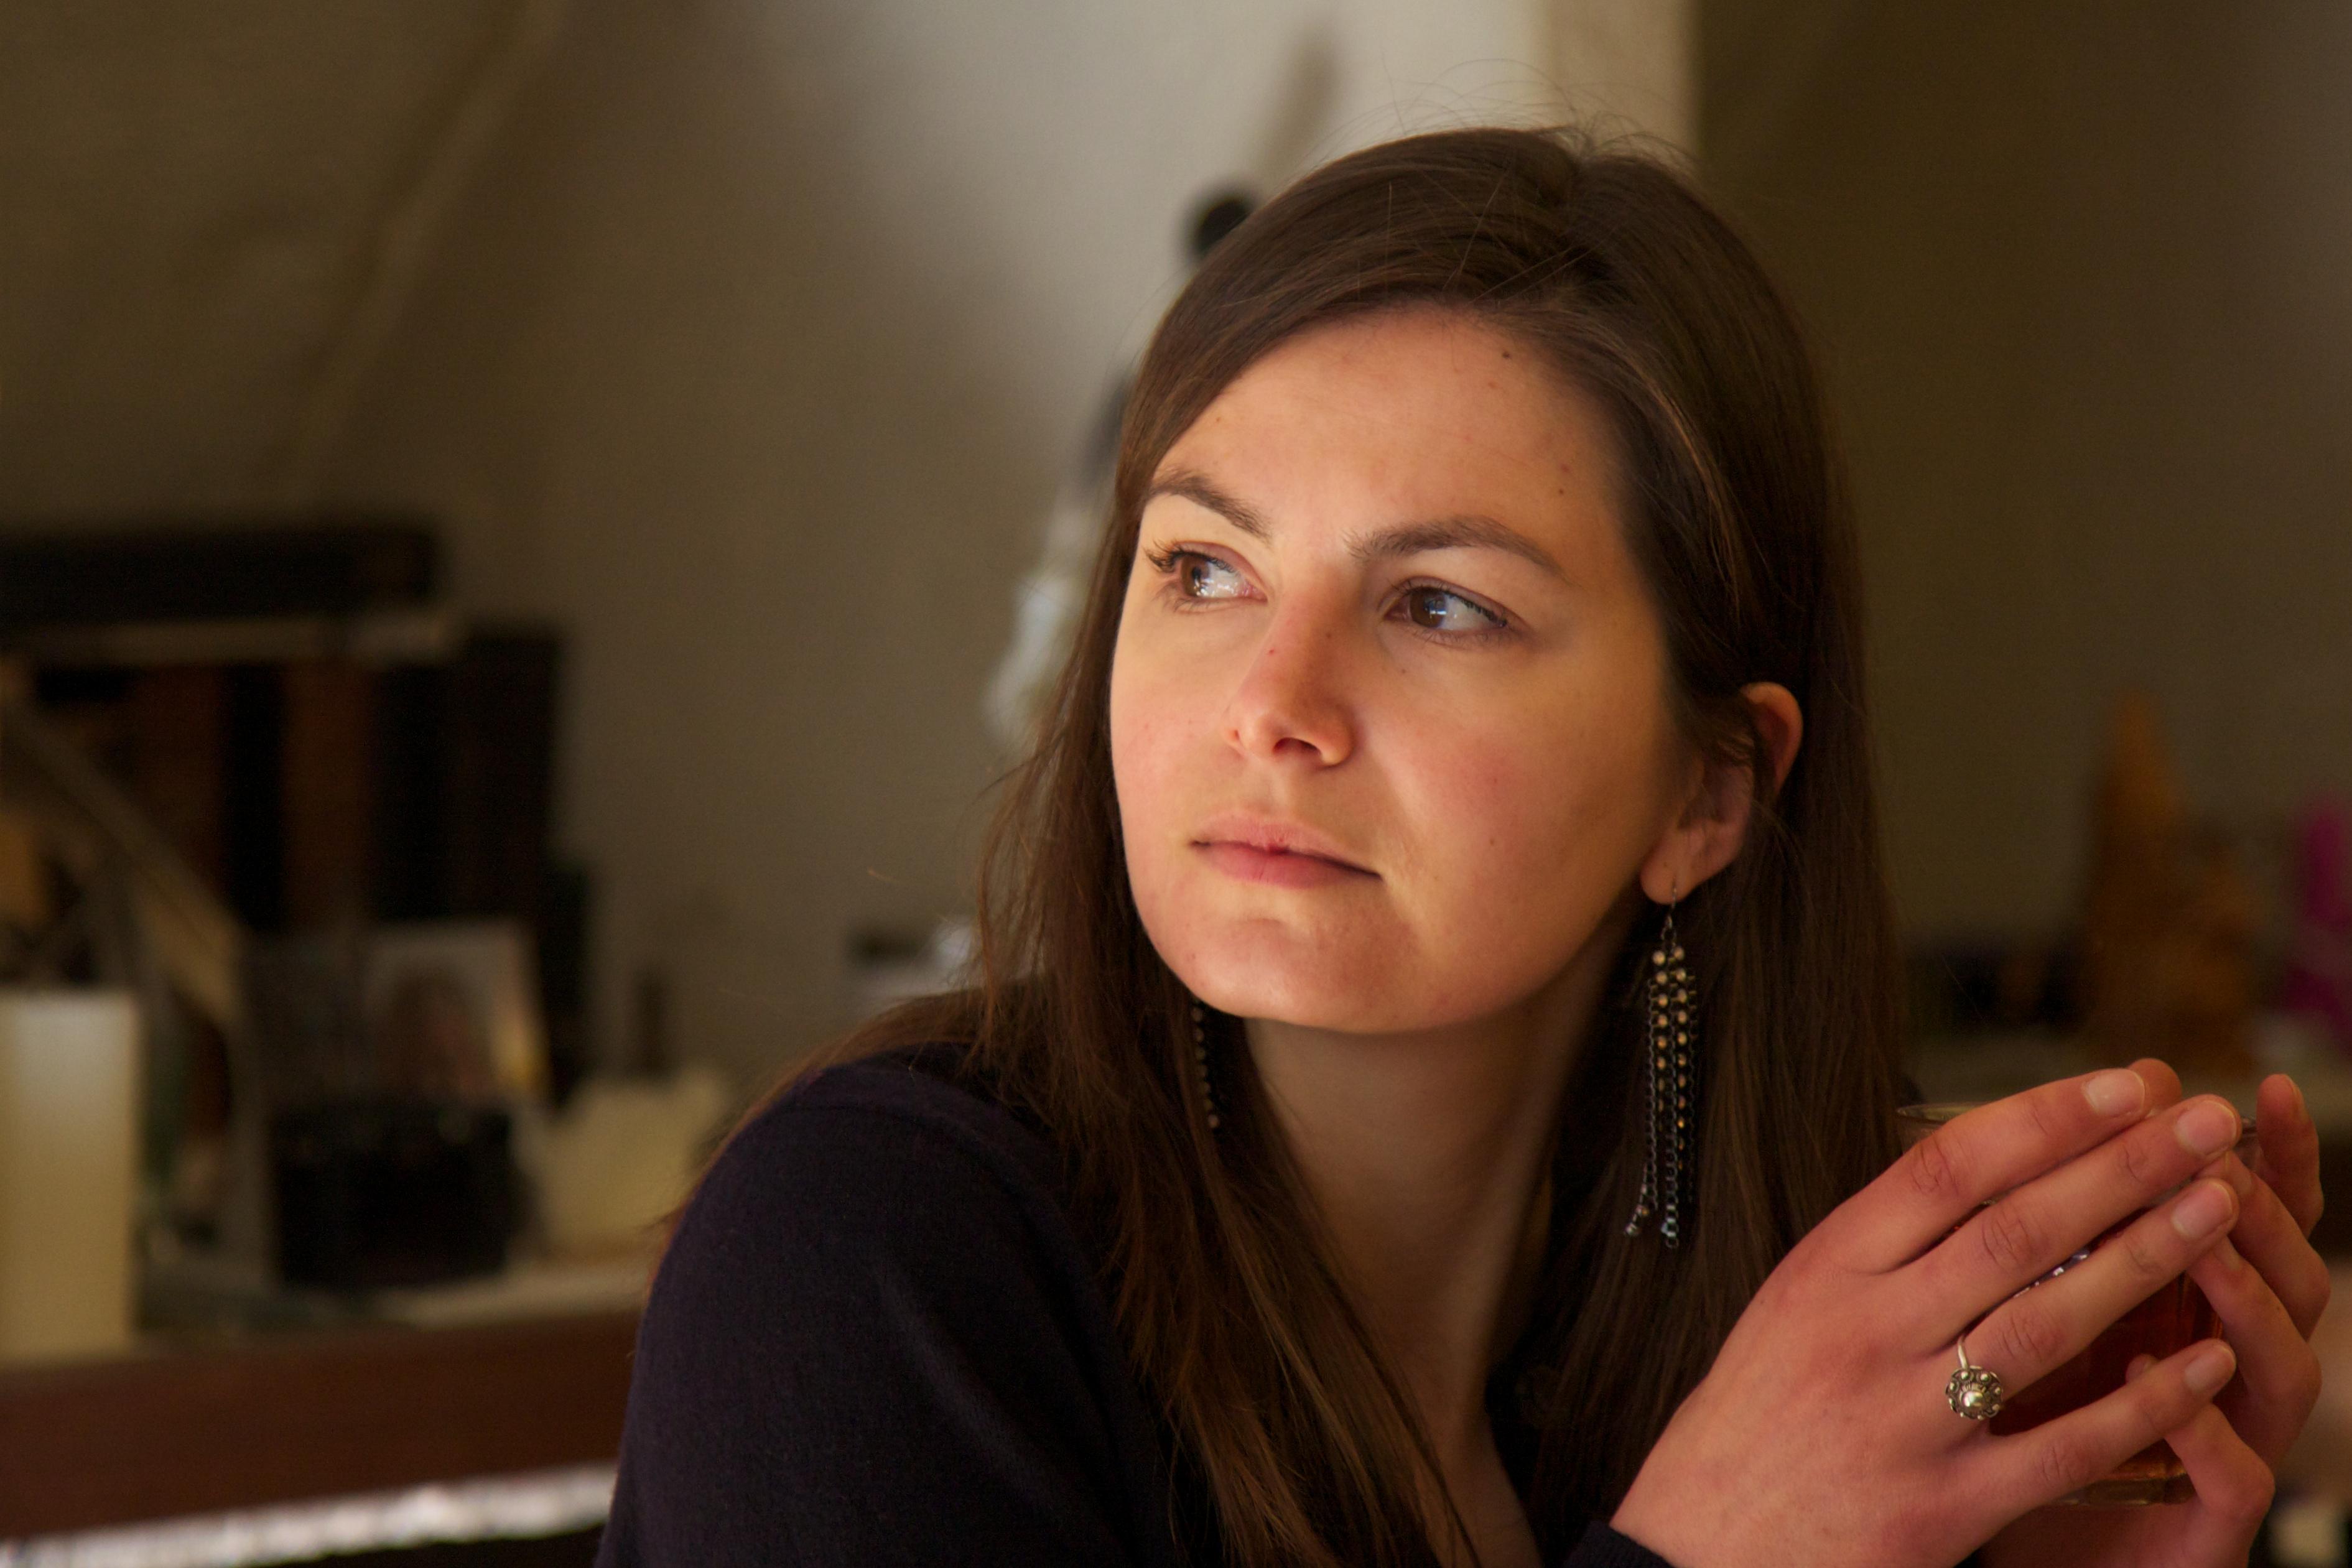 Marthe van der Hilst